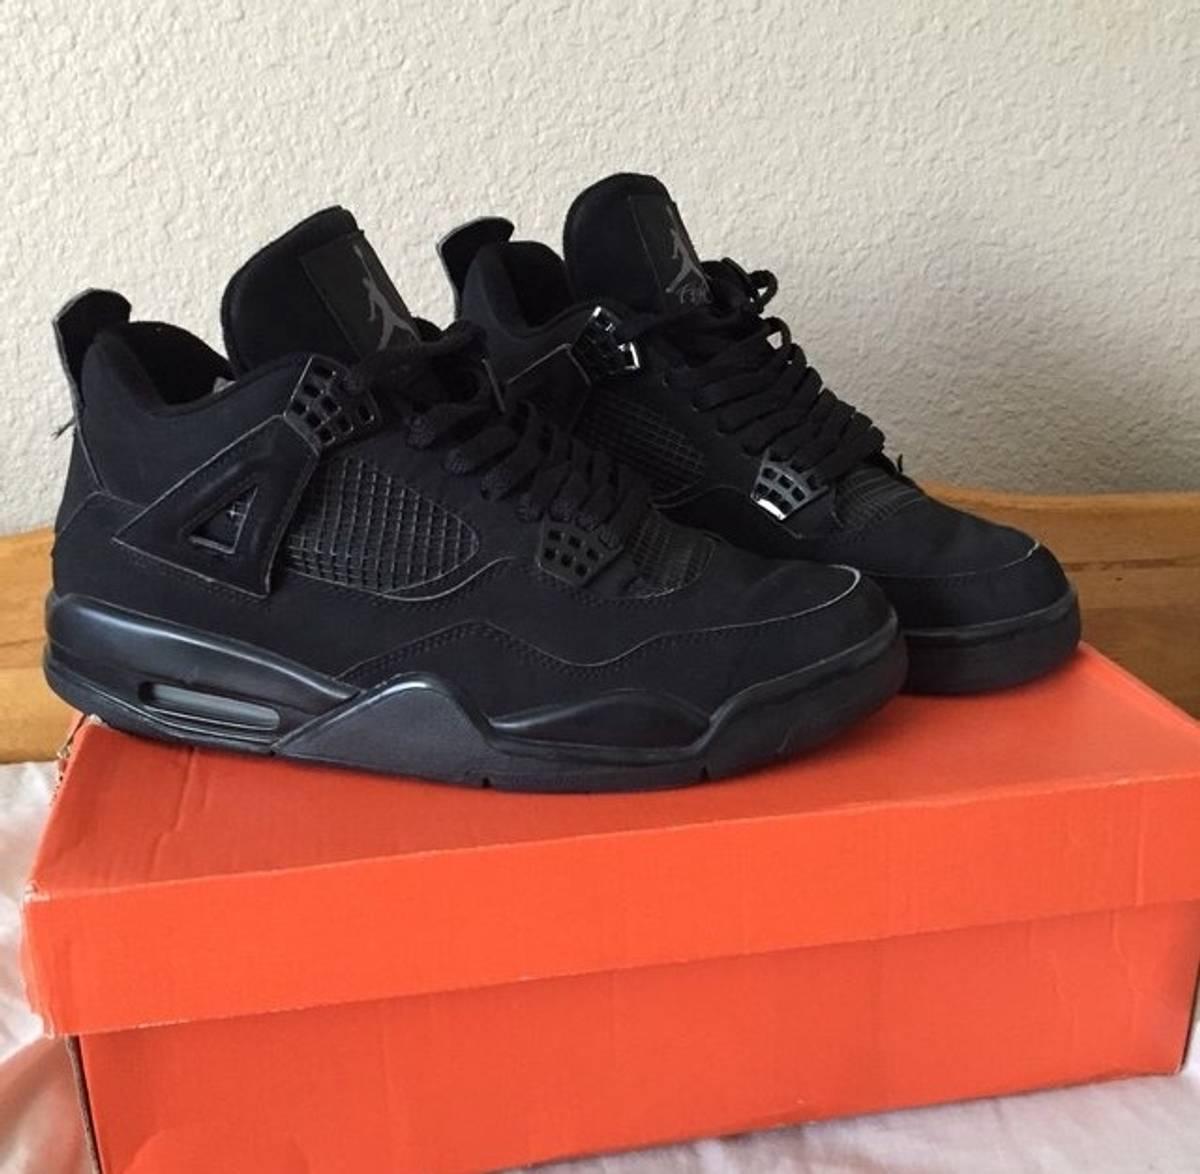 13c2fd35f63d ... Jordan Brand Black Cat 4s Size 10 - Low-Top Sneakers for Sale - Grailed  ...